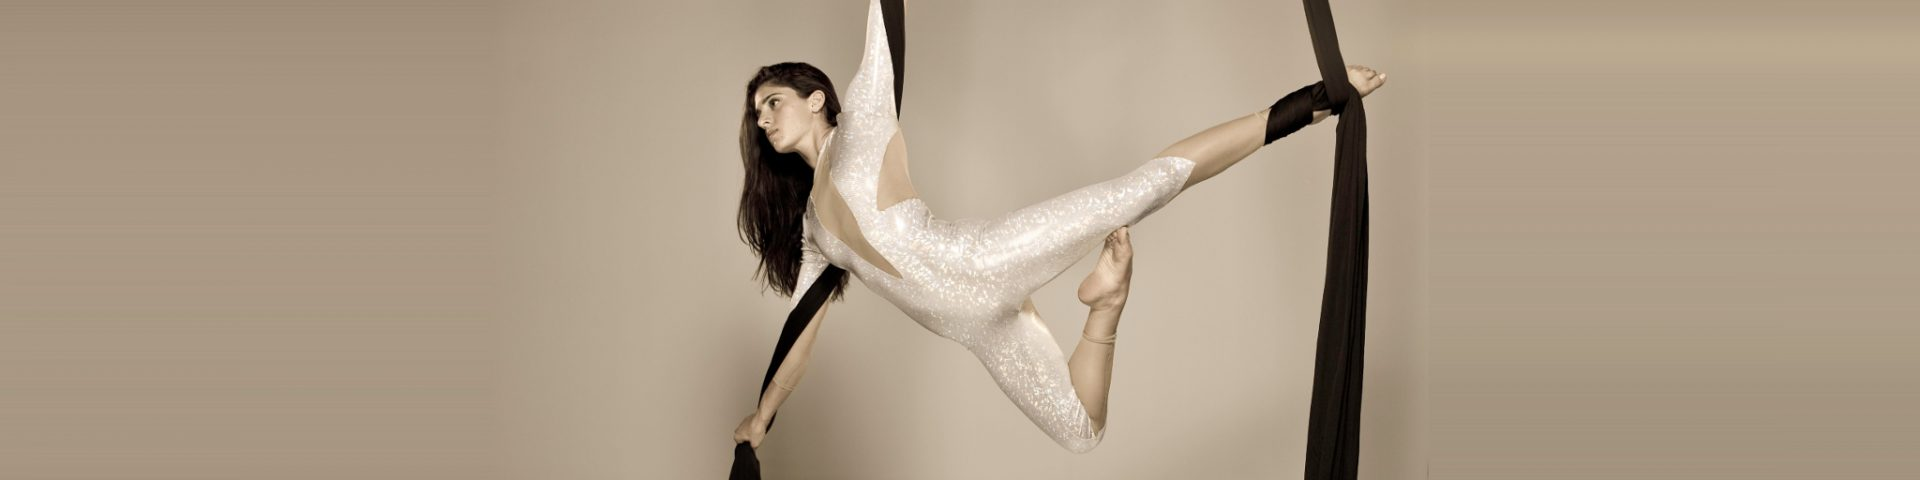 Exchange Aerial Silk